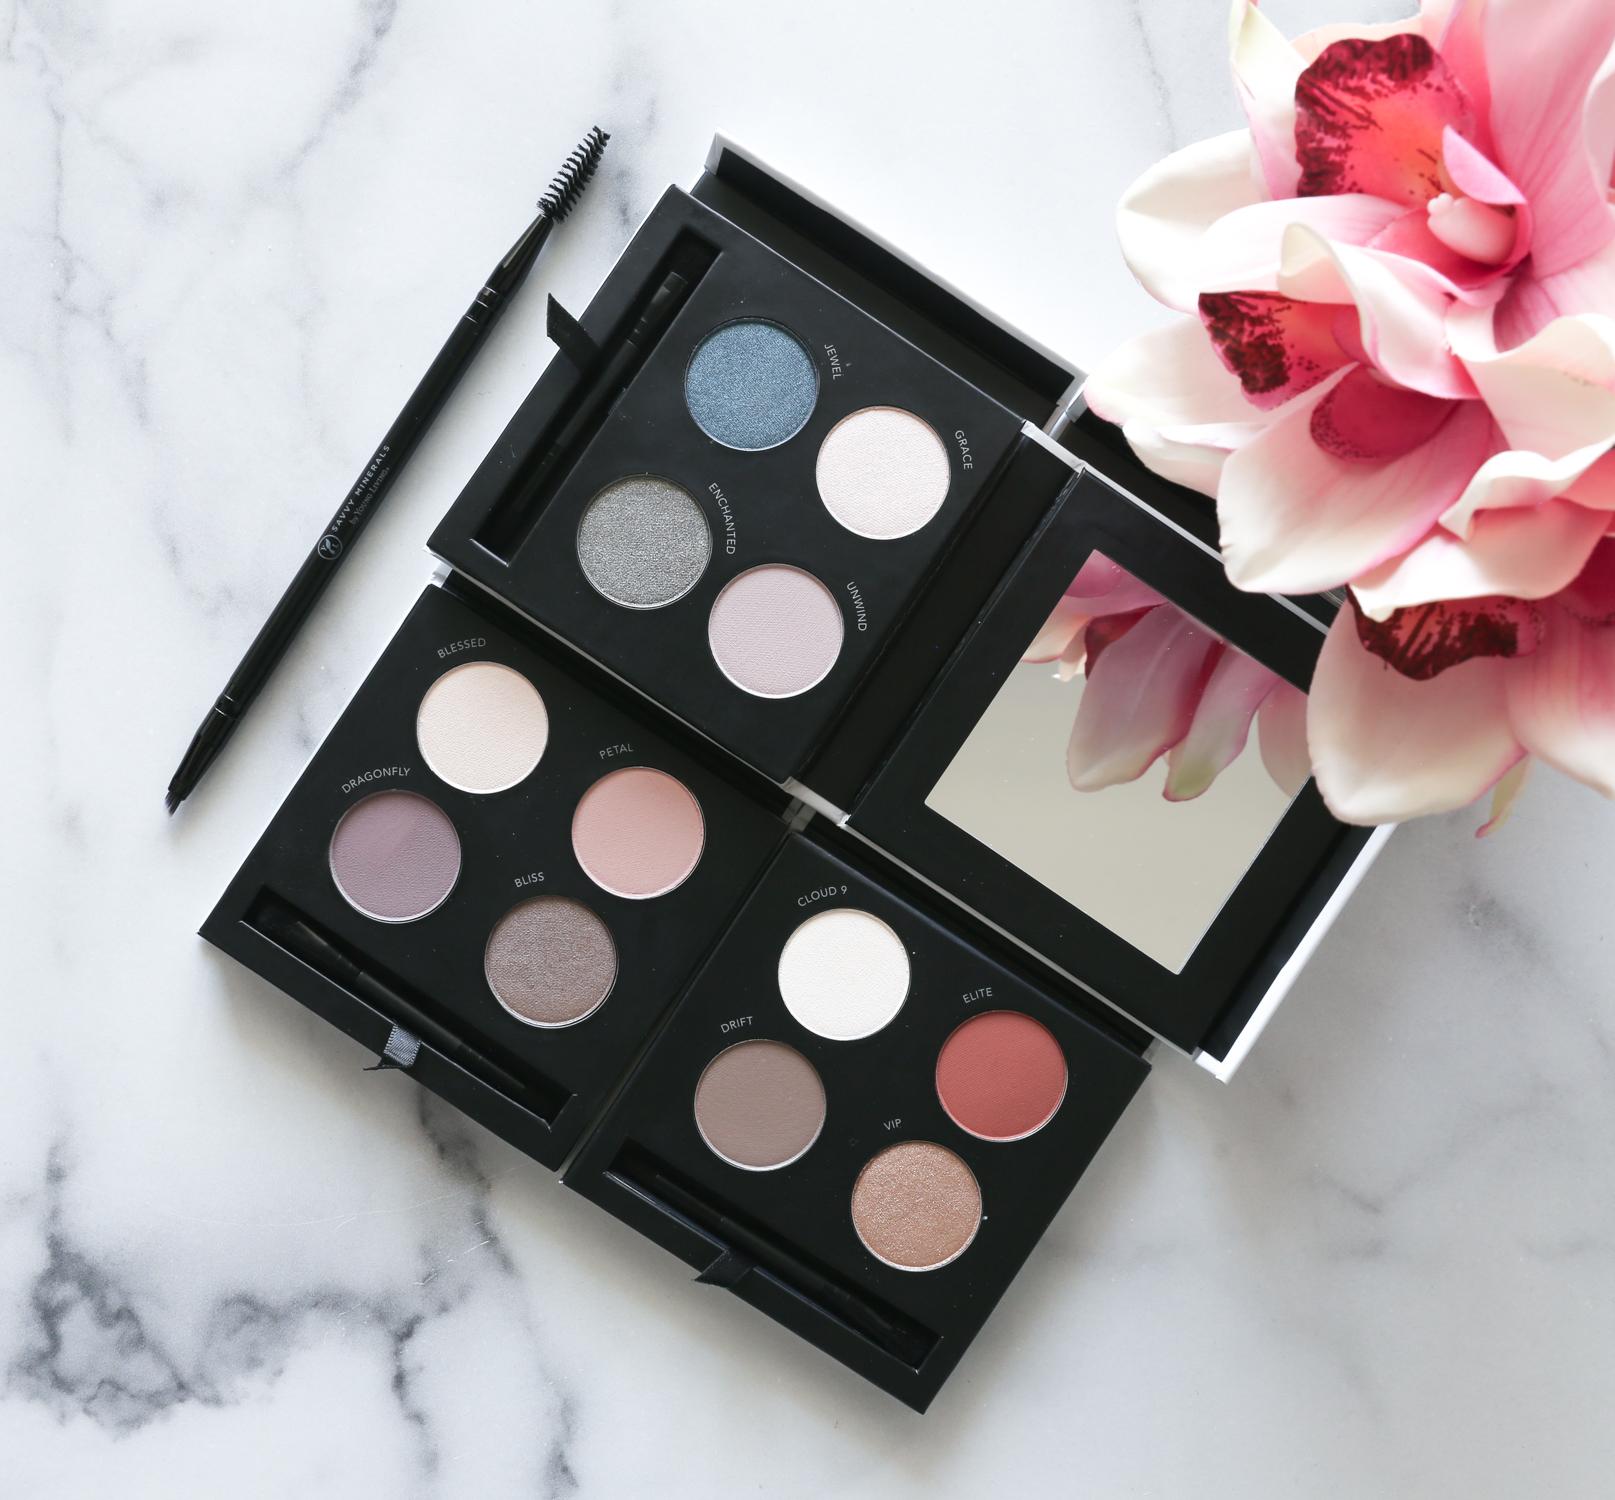 Savvy-Mineral-Dual-Lash-Brush-Eyeshadow-Palettes-1.jpg